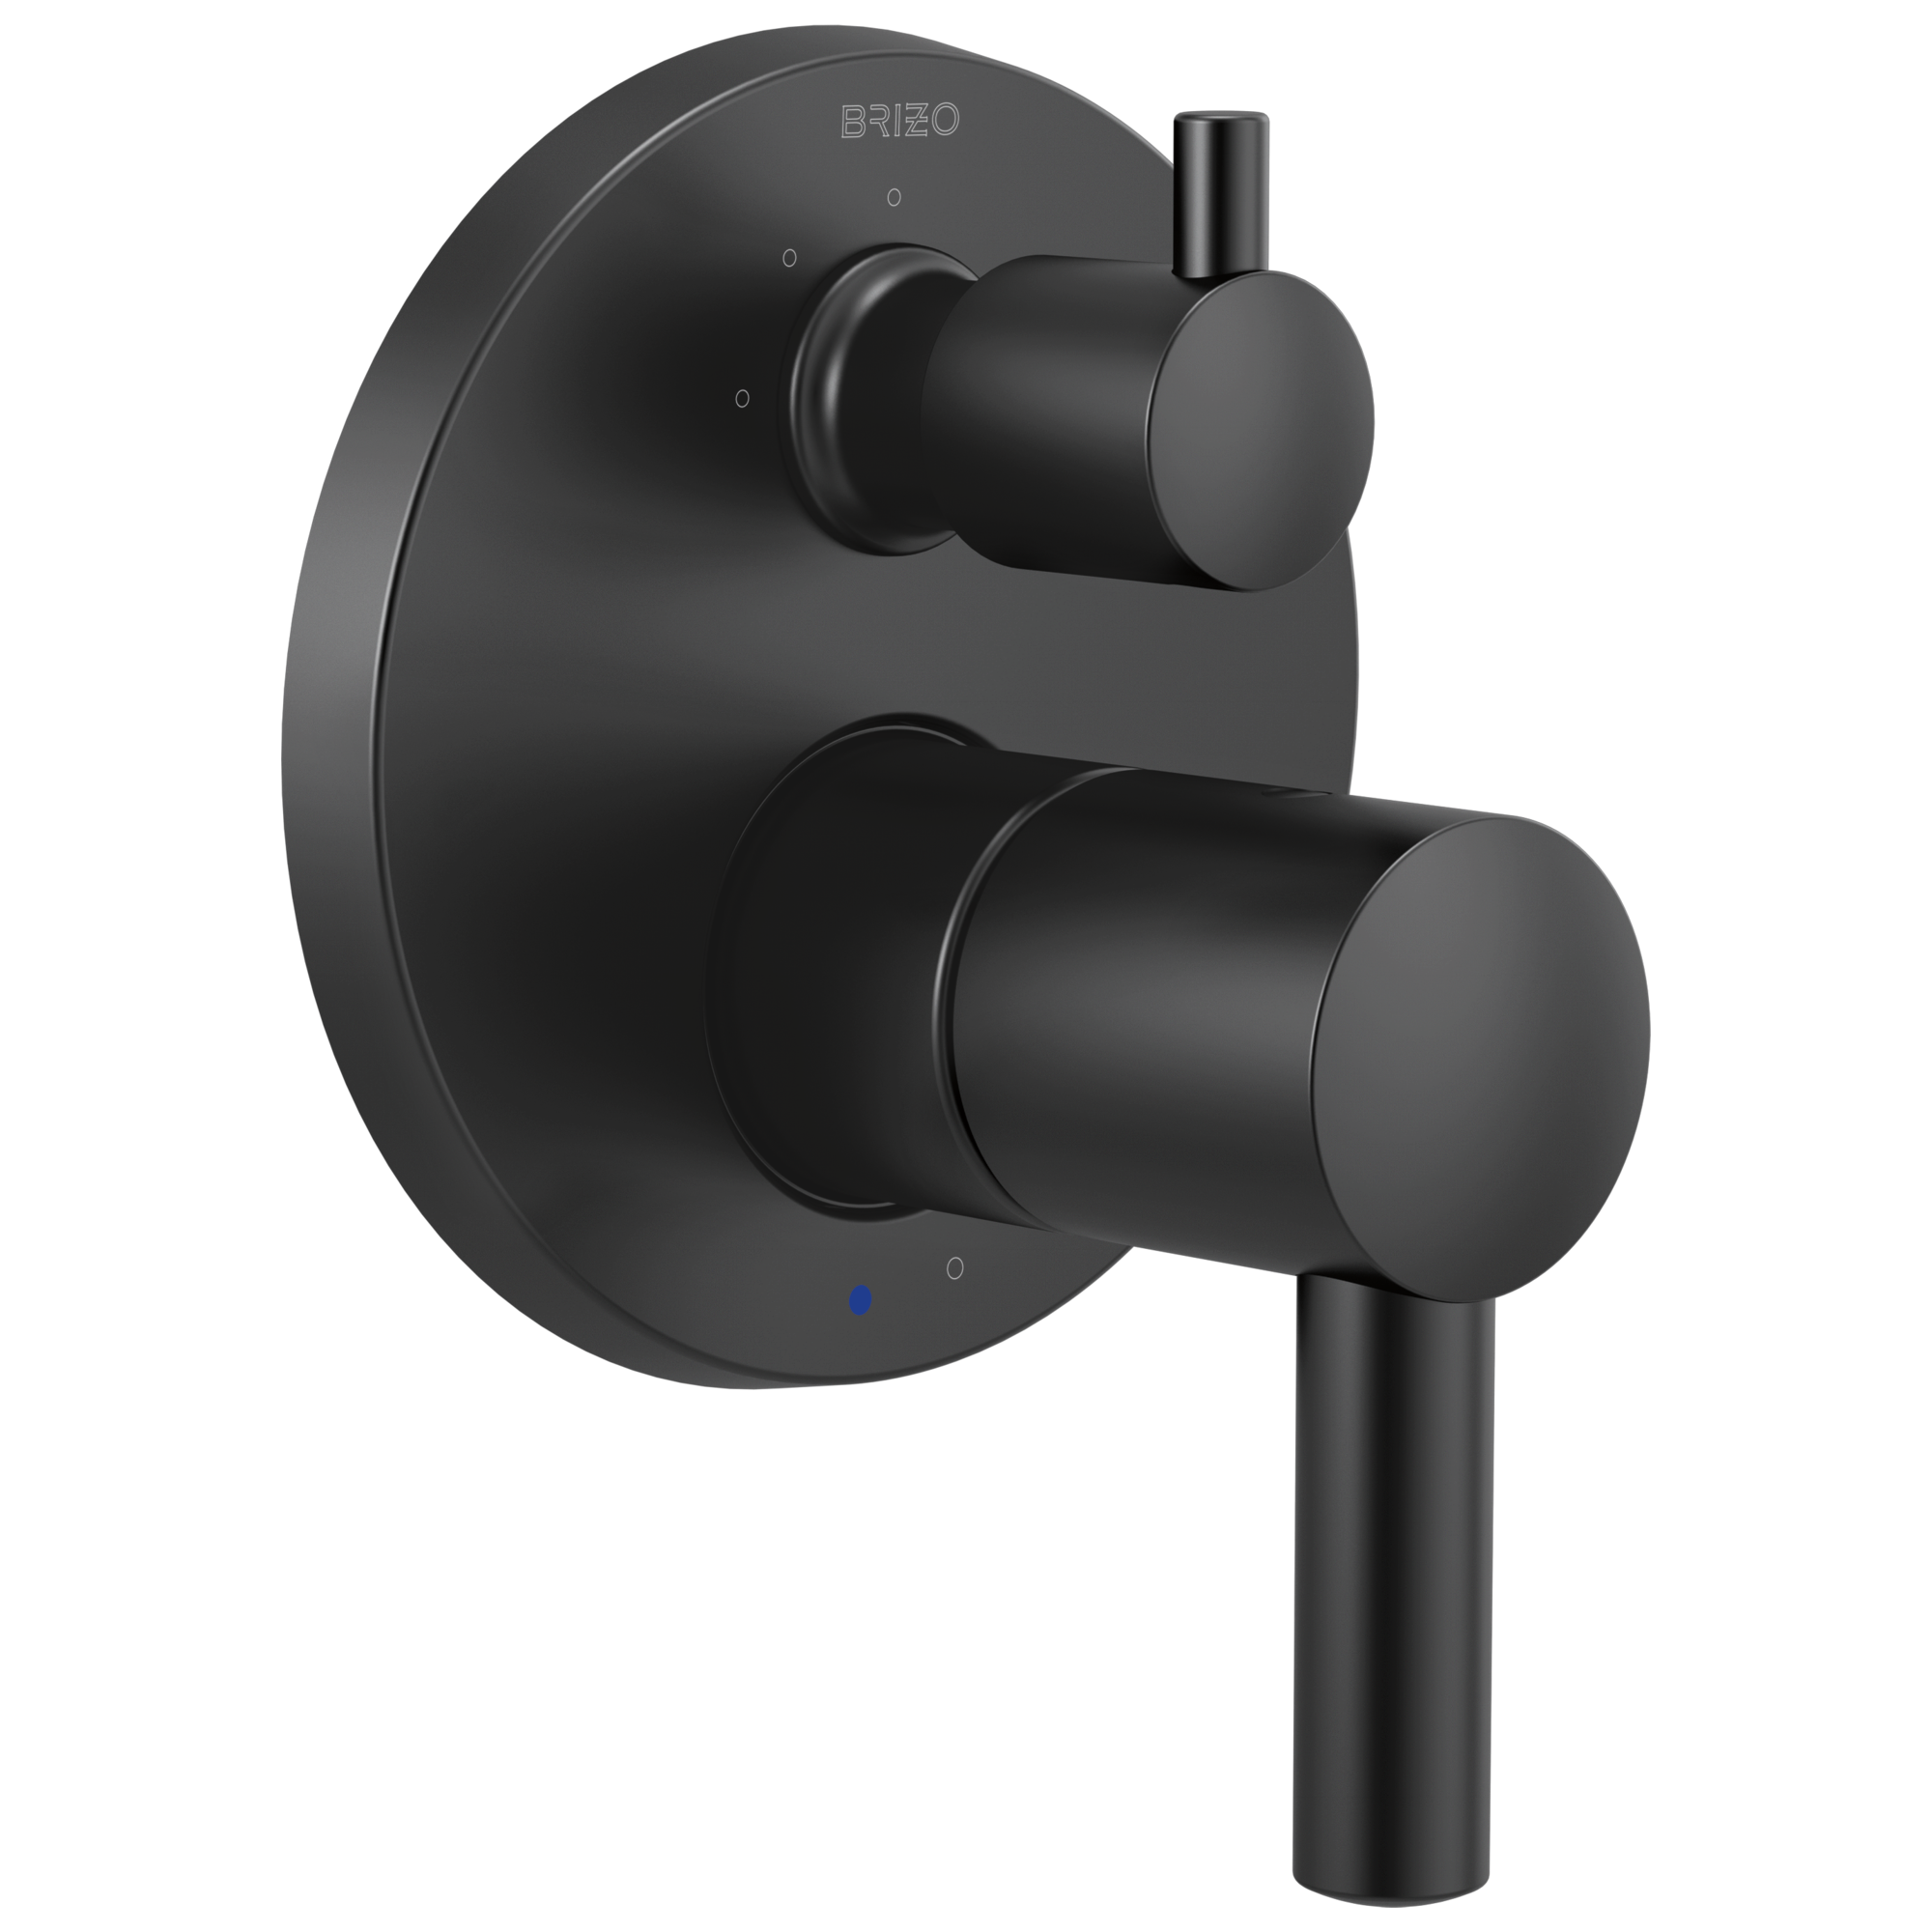 Brizo 3-Function Non-Shared Diverter Cartridge